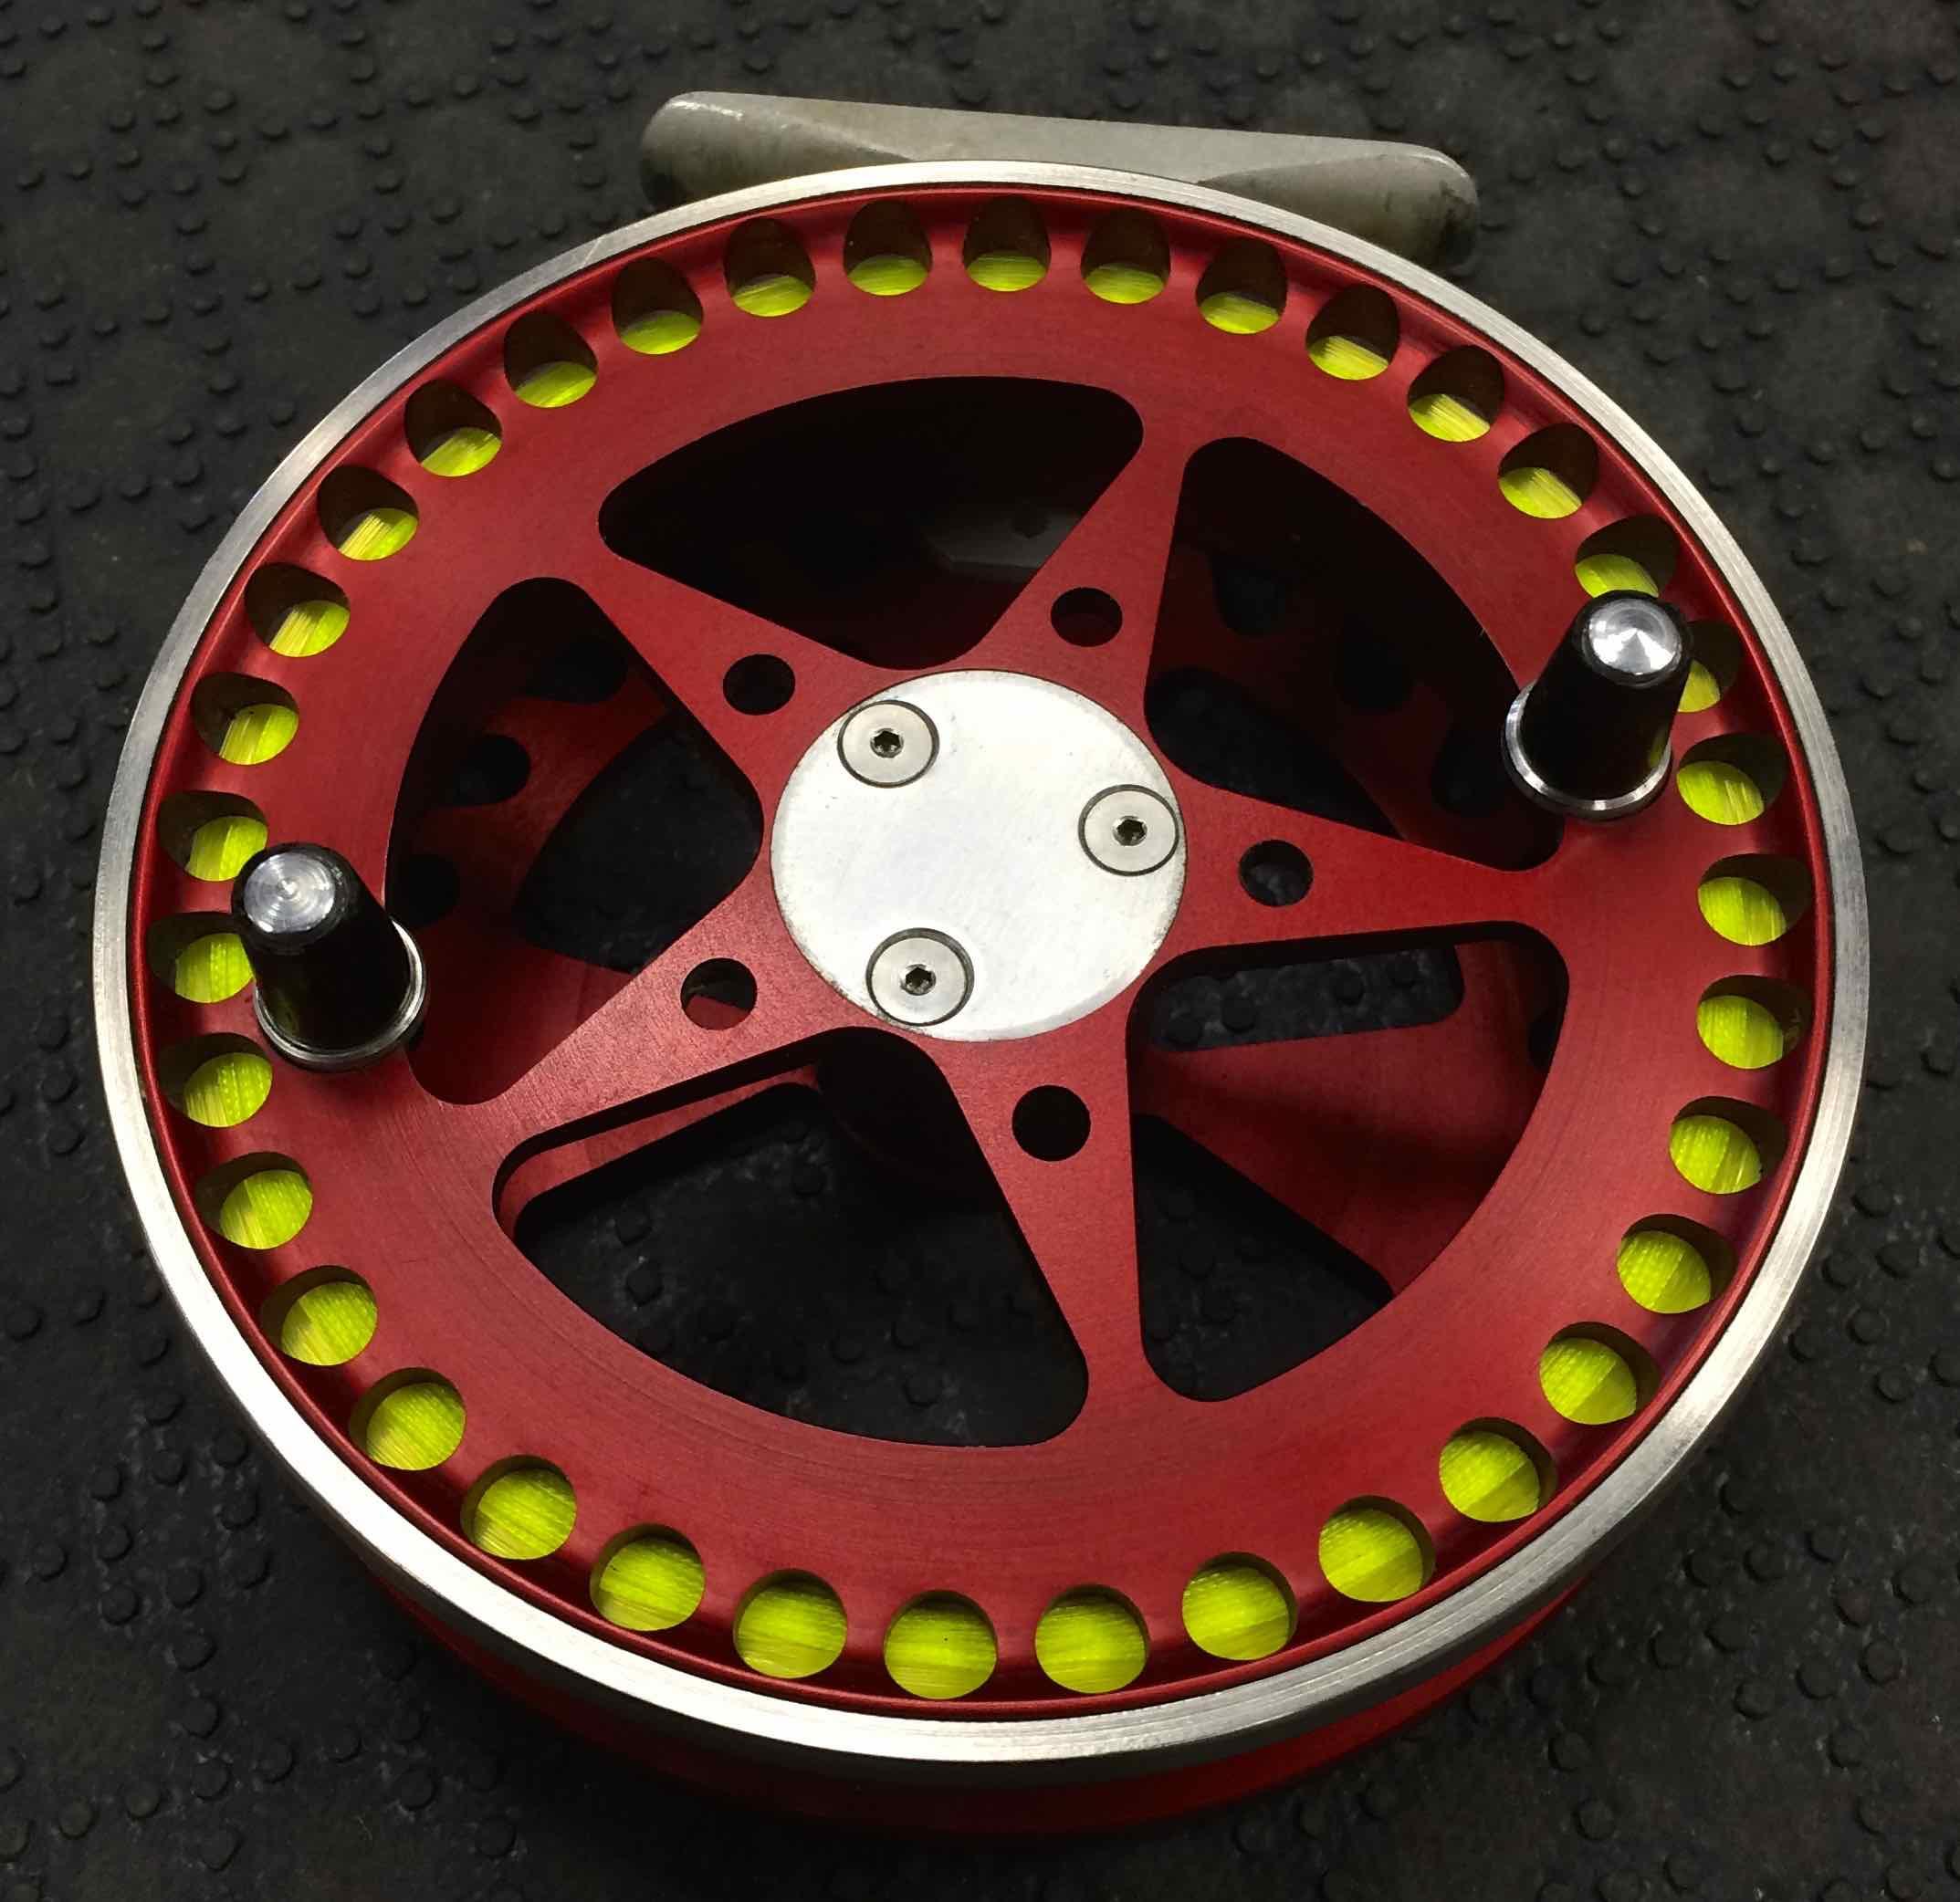 Custom HLS Float Reel Rosewood Handles Slainless Palming Ring Red Front Resized for Web